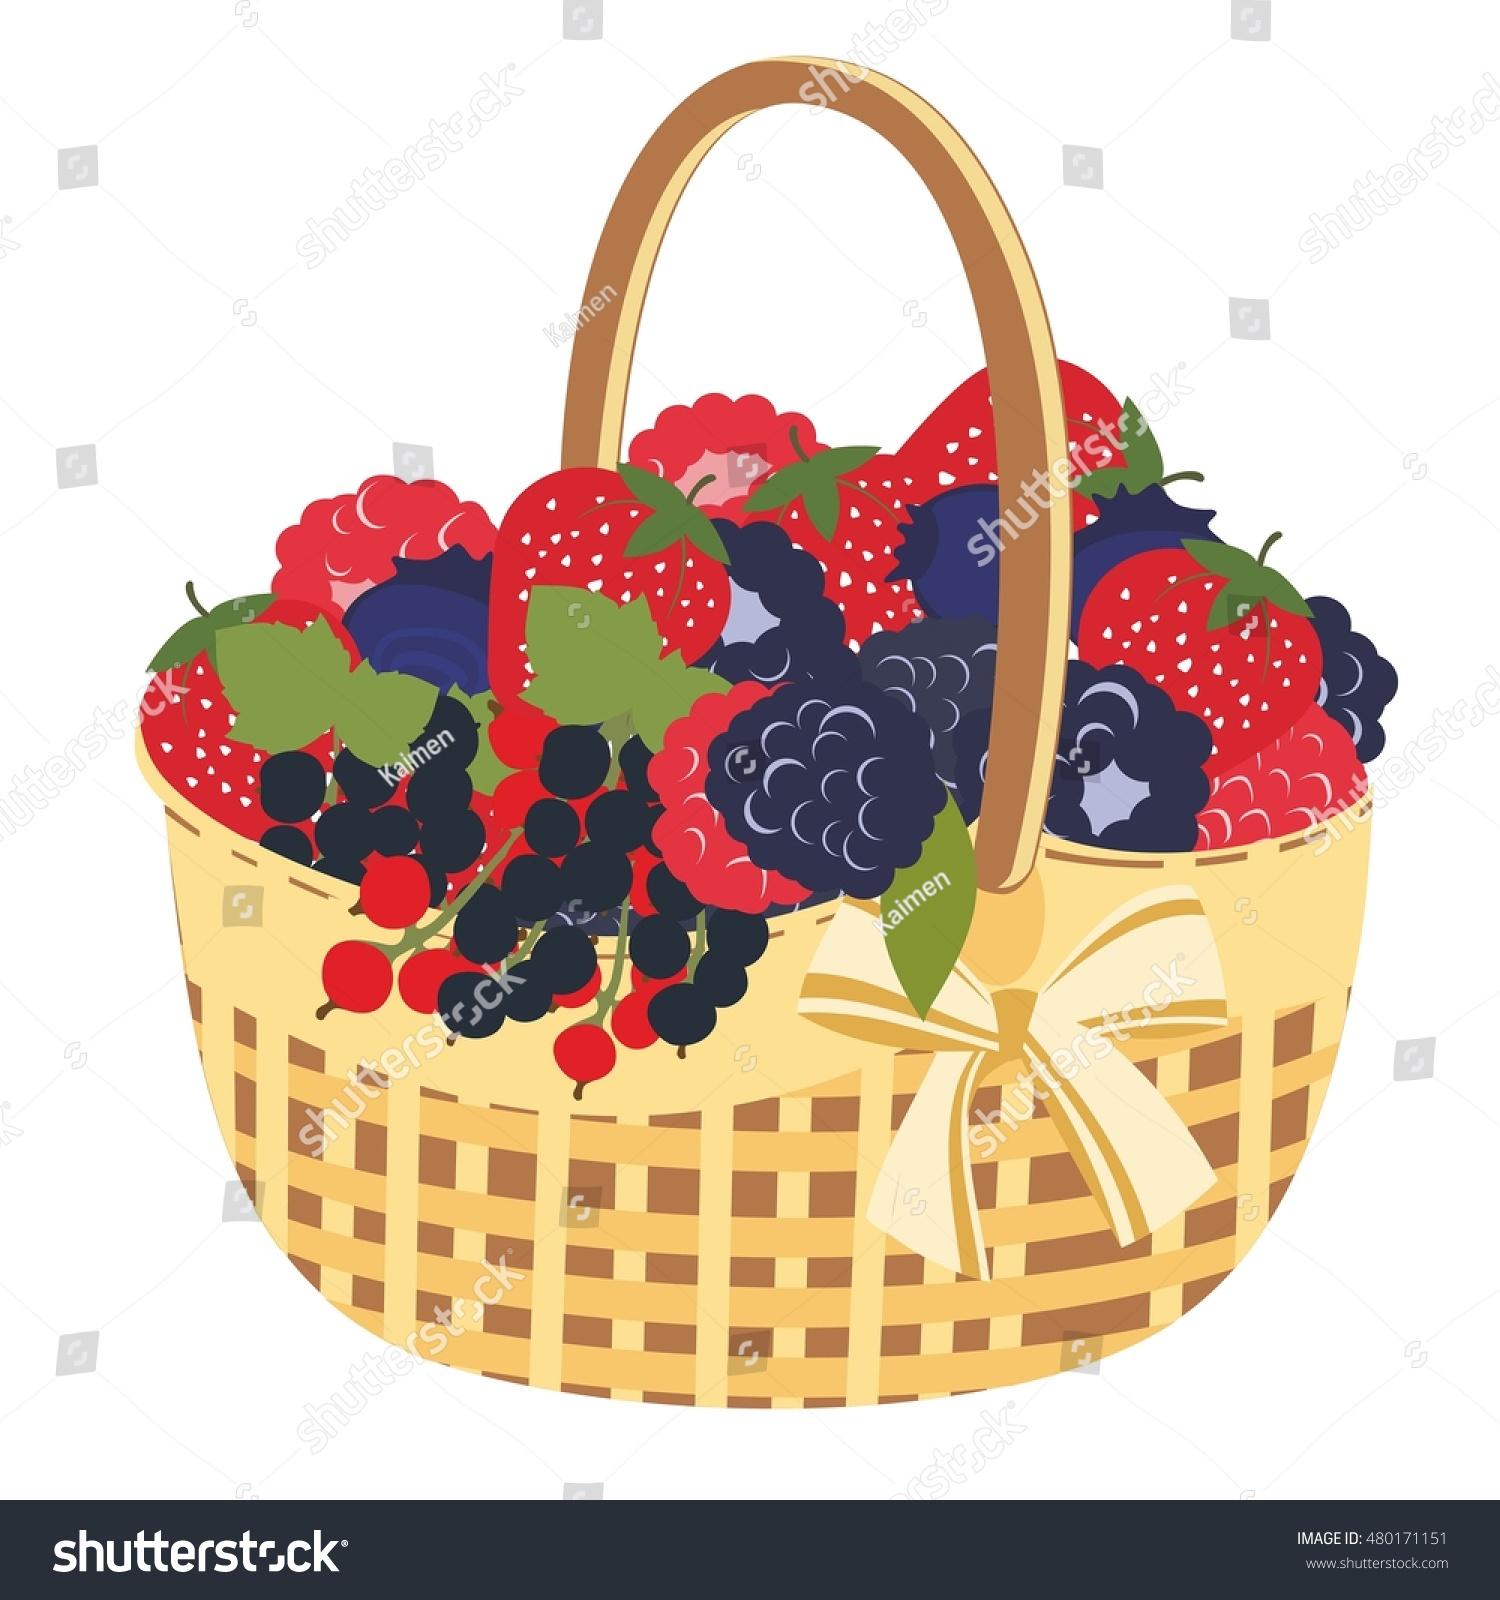 Berry Basket Clip Art